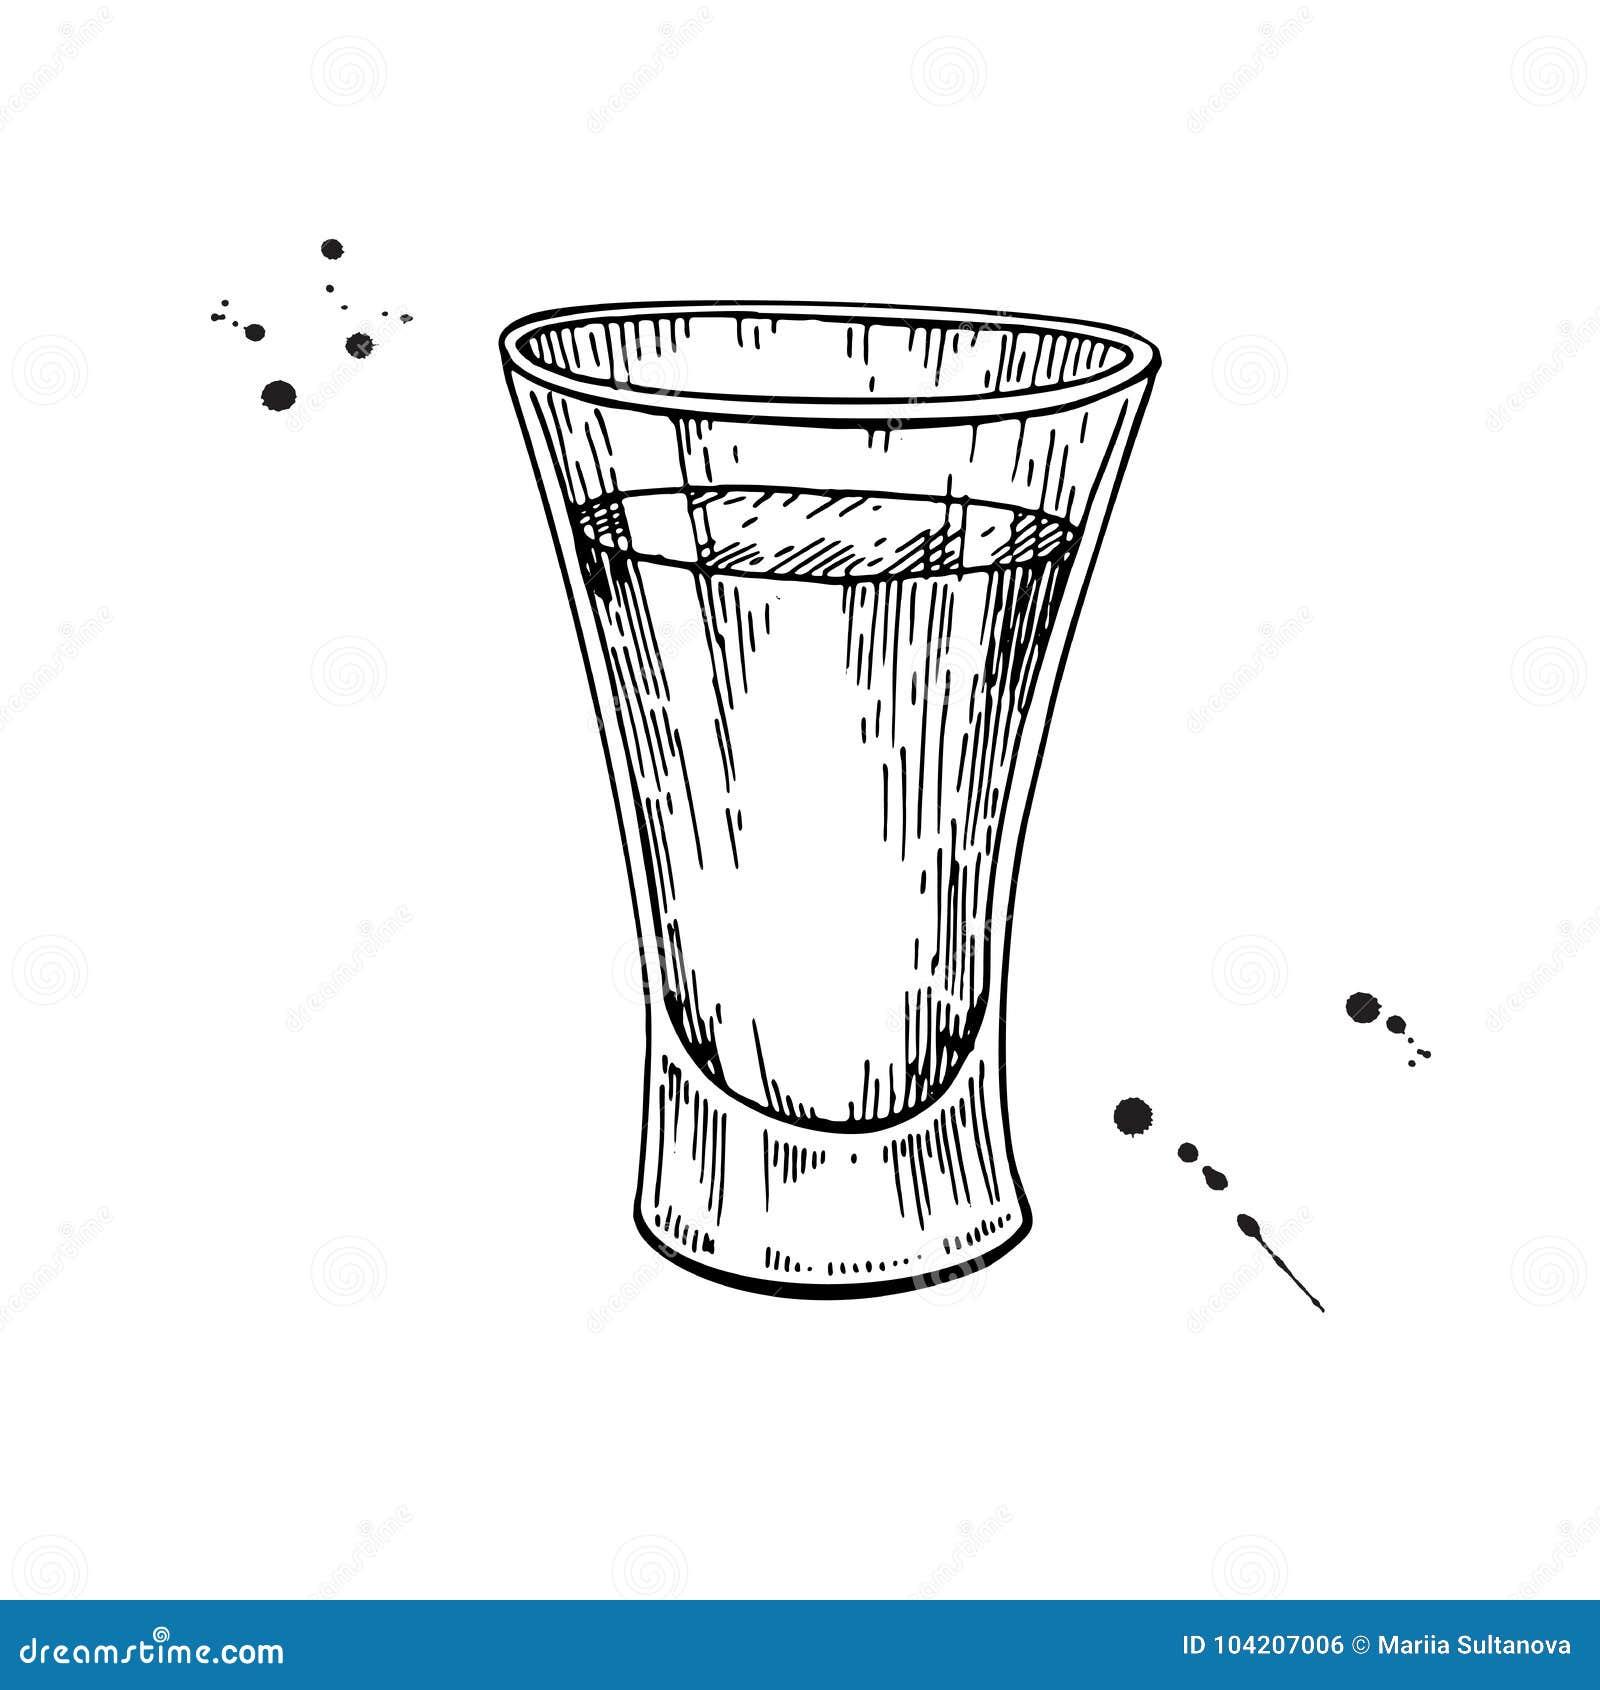 Dessin de verre liqueur tequila vodka cocktail vect - Dessin de verre ...